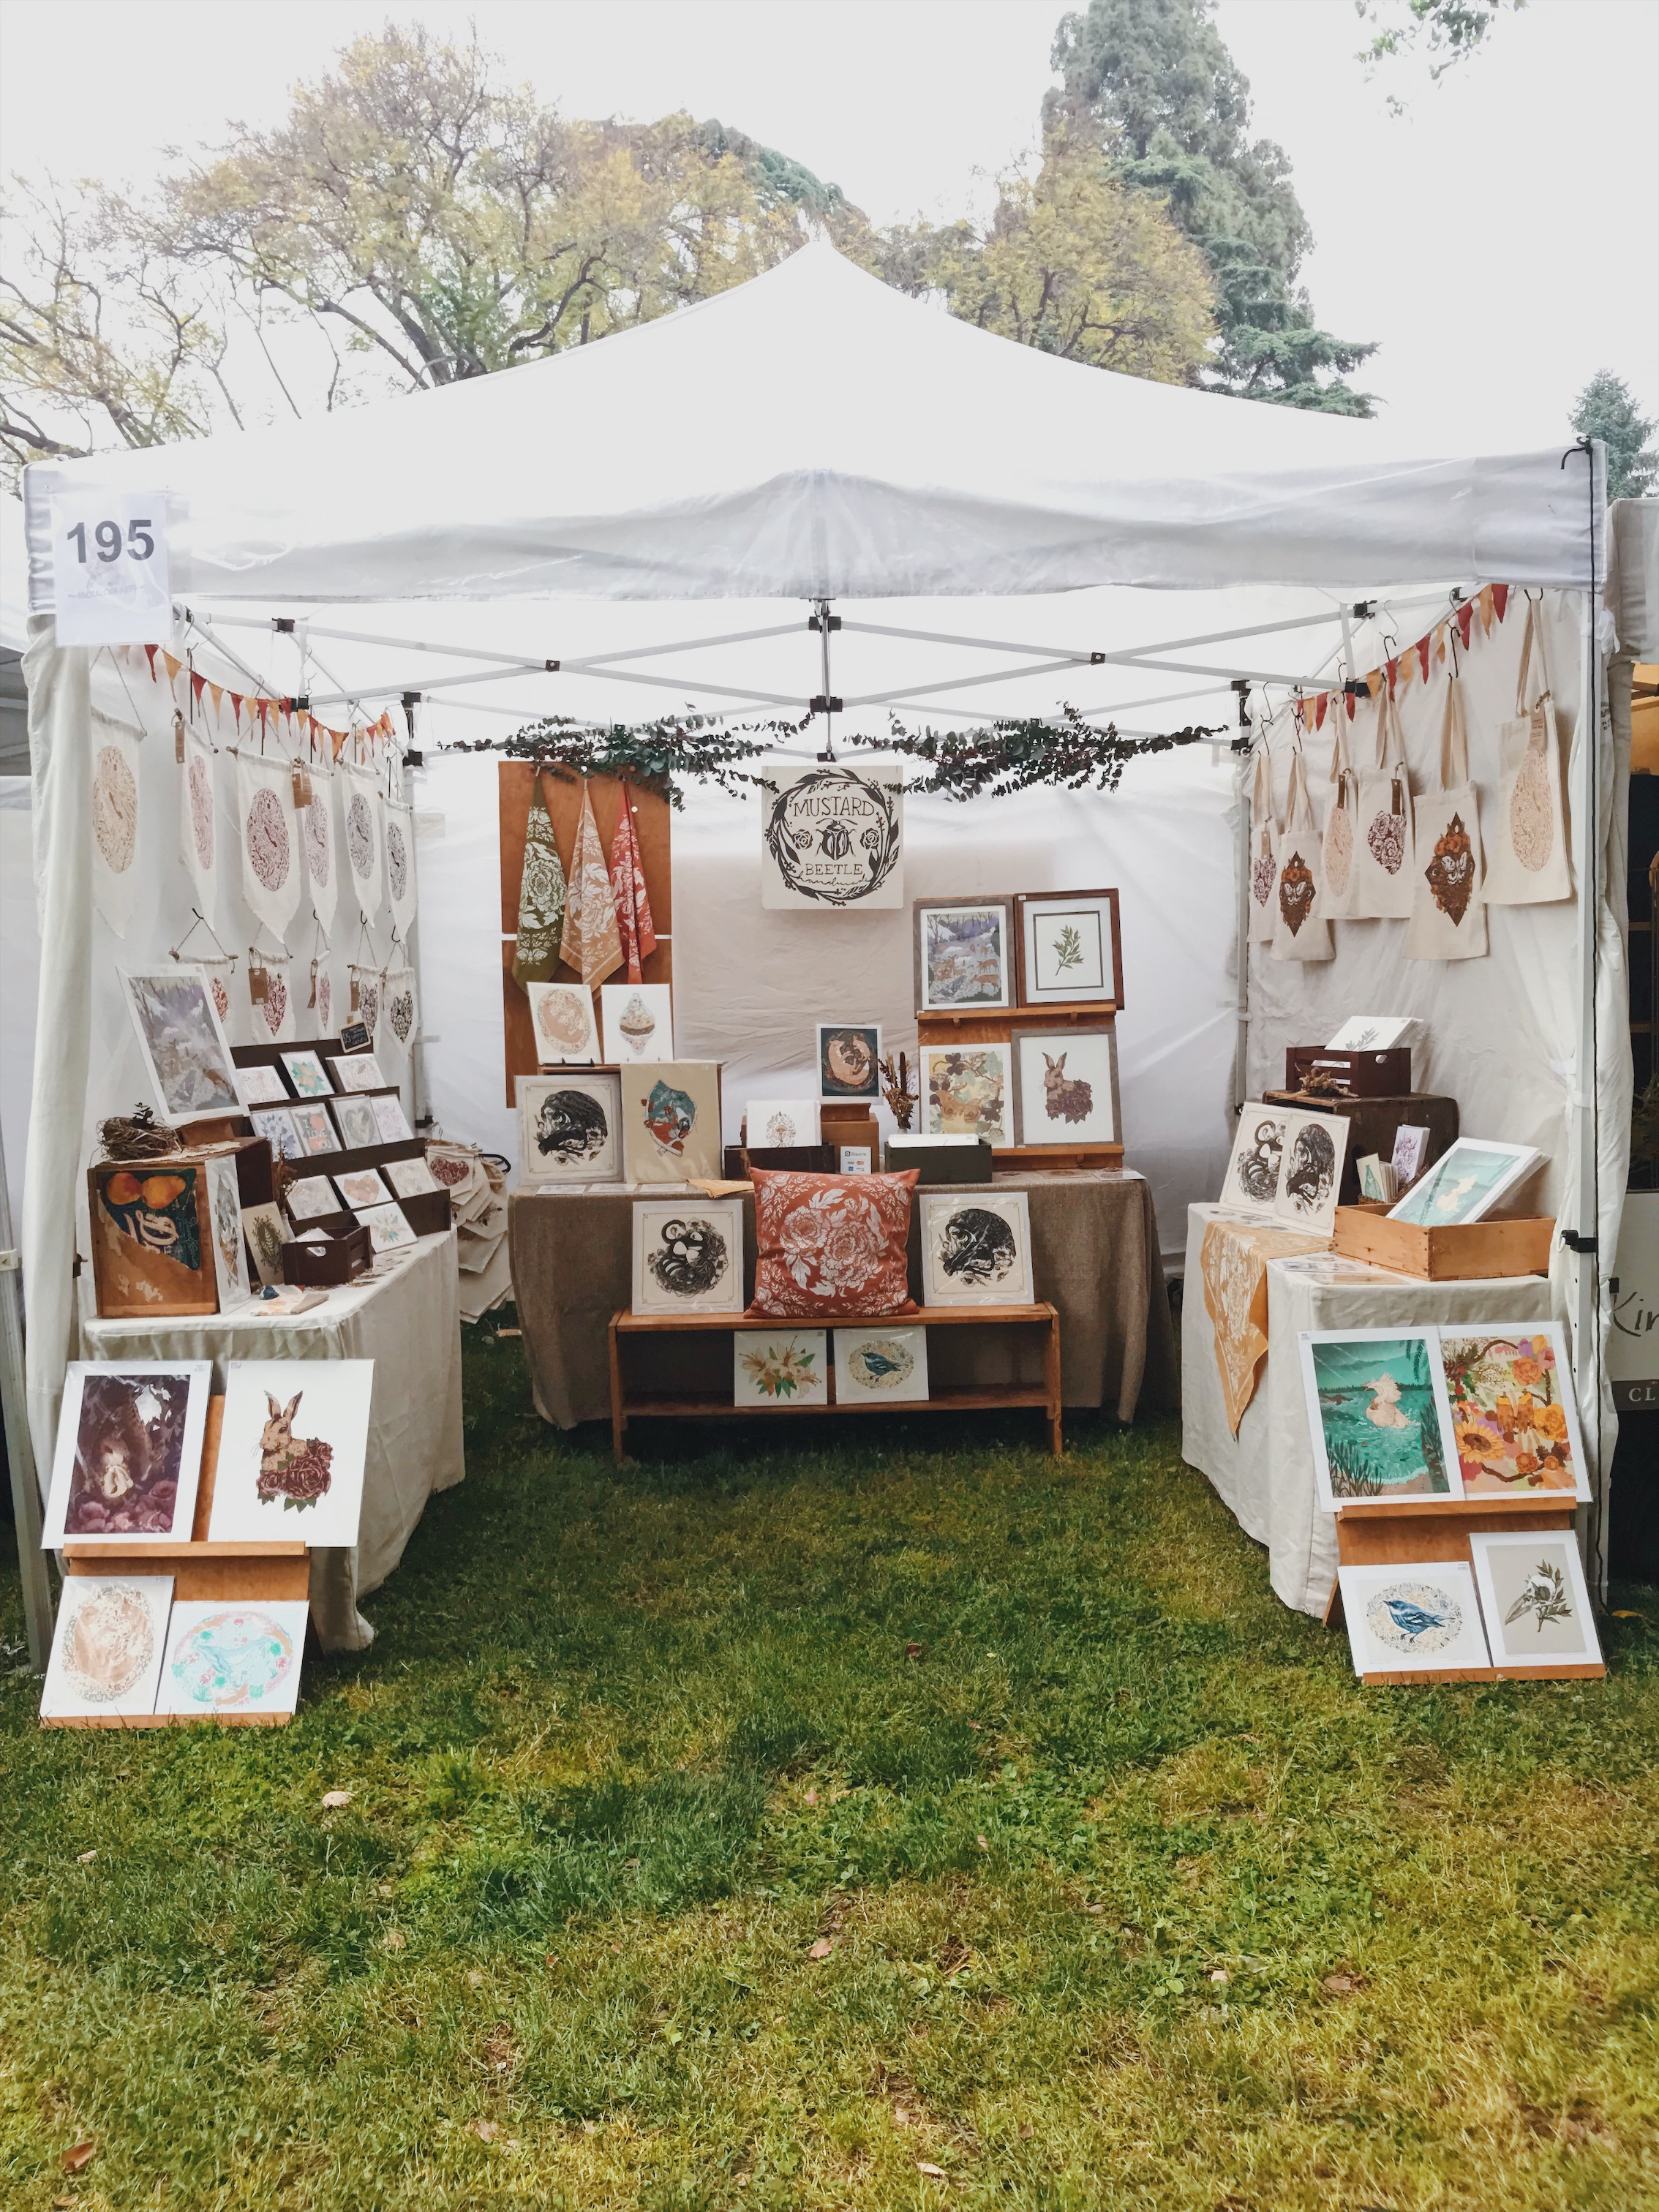 Jackalope Indie Artisan Fair (Pasadena, CA), April 2019